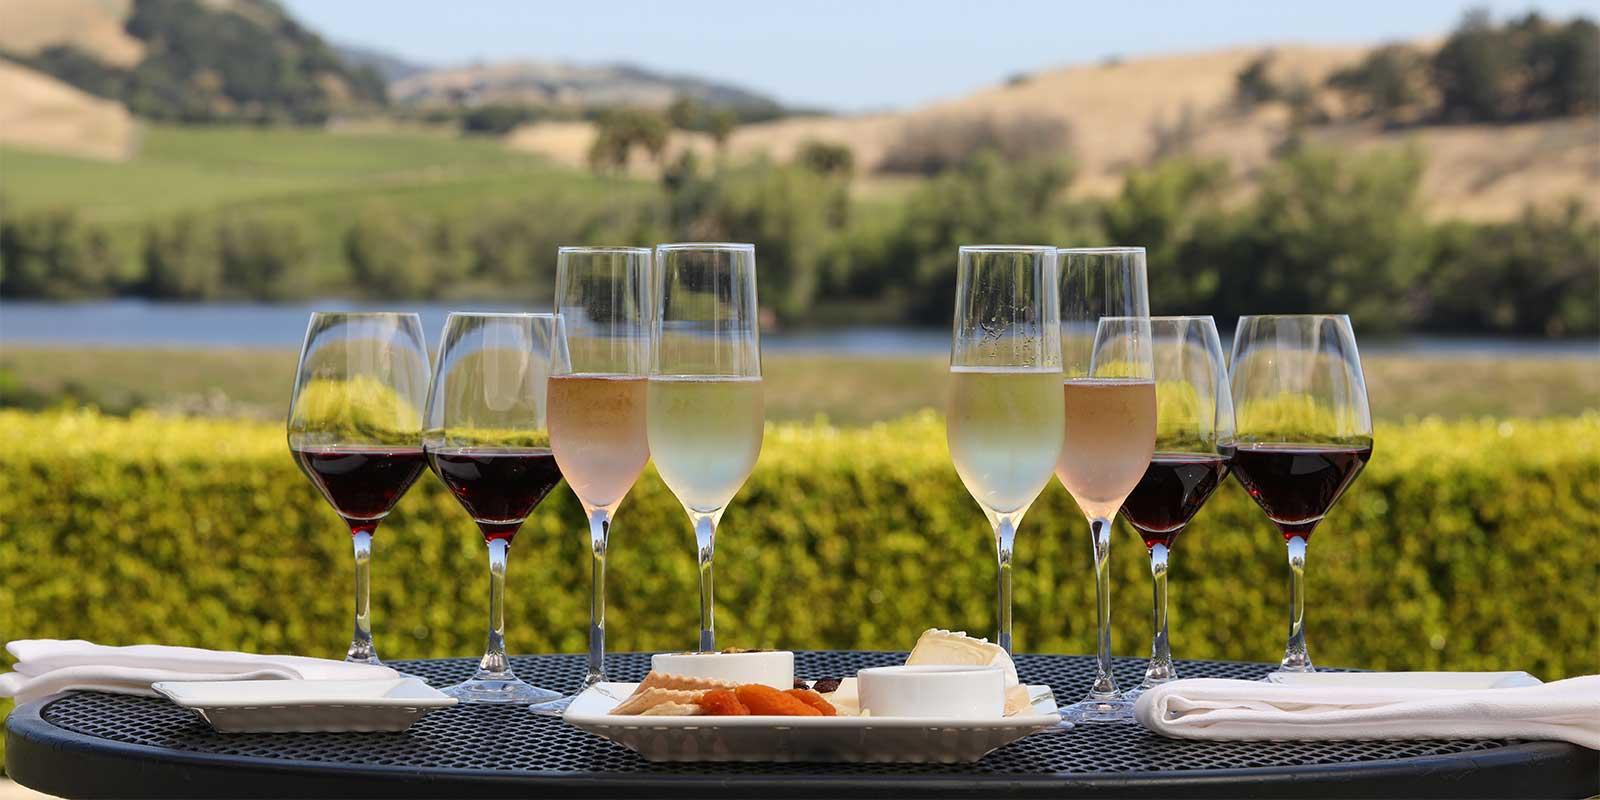 Family Winery and Farm